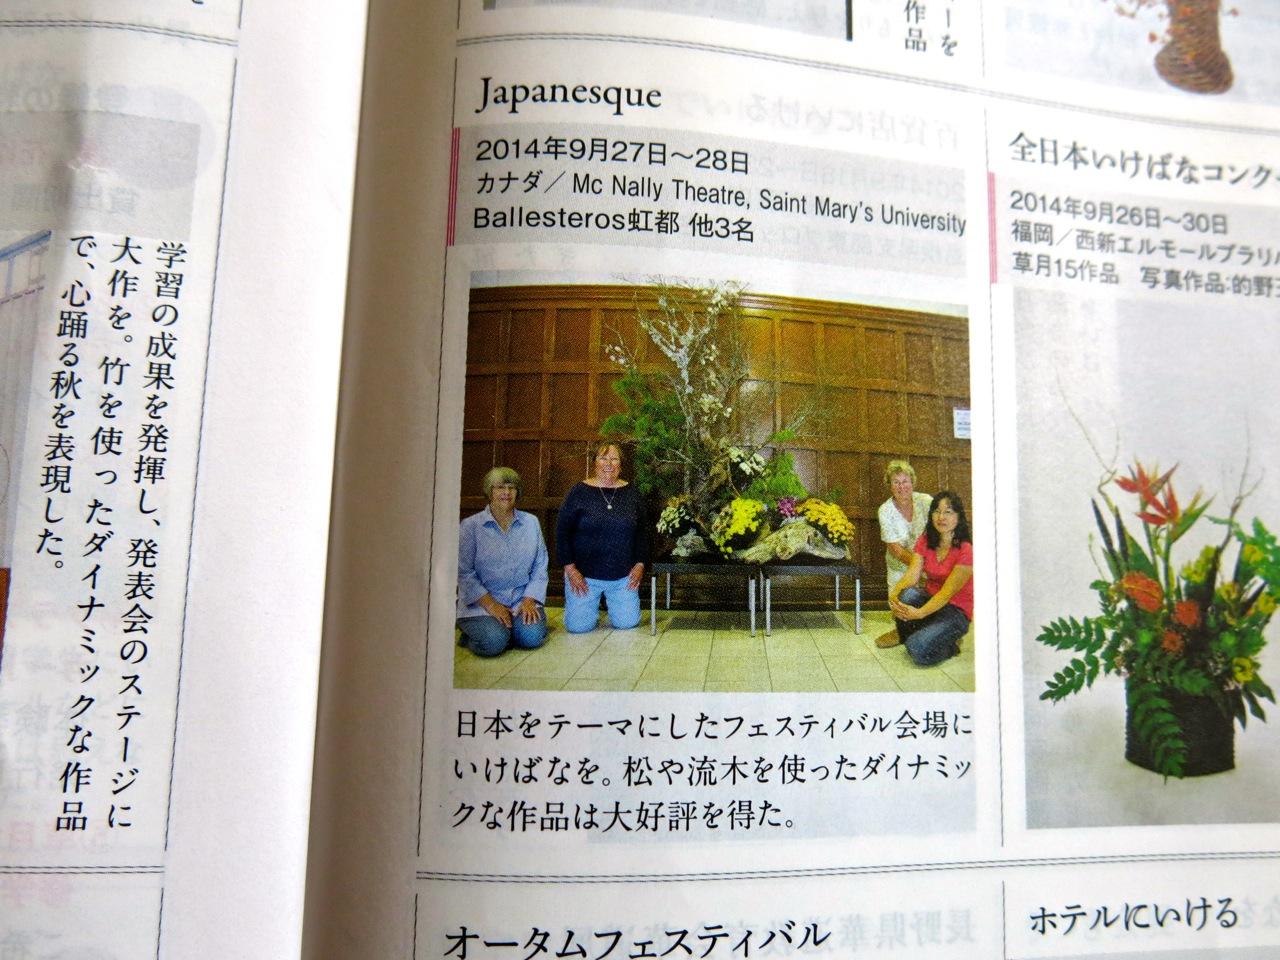 L-R: Jean H., Patti V., Val S. and Miyako.